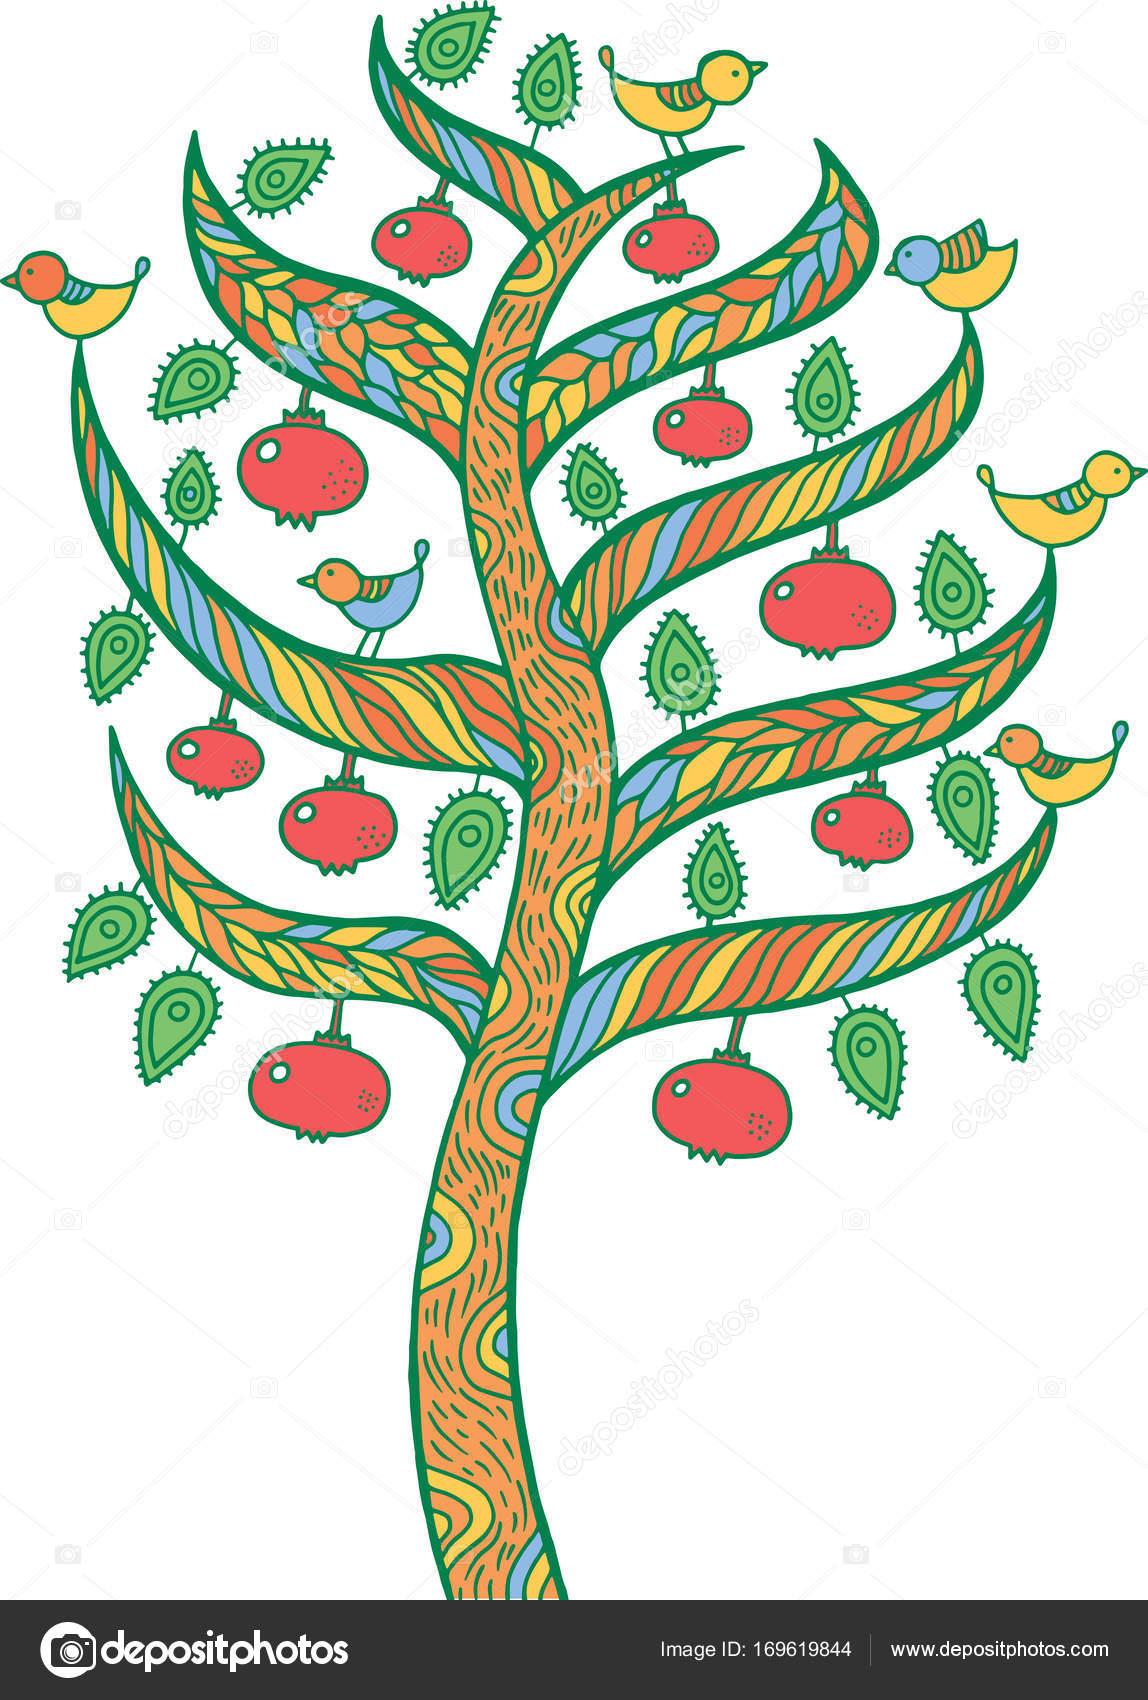 Pomegranate tree - kids illustration. Colorful doodle art drawin ...